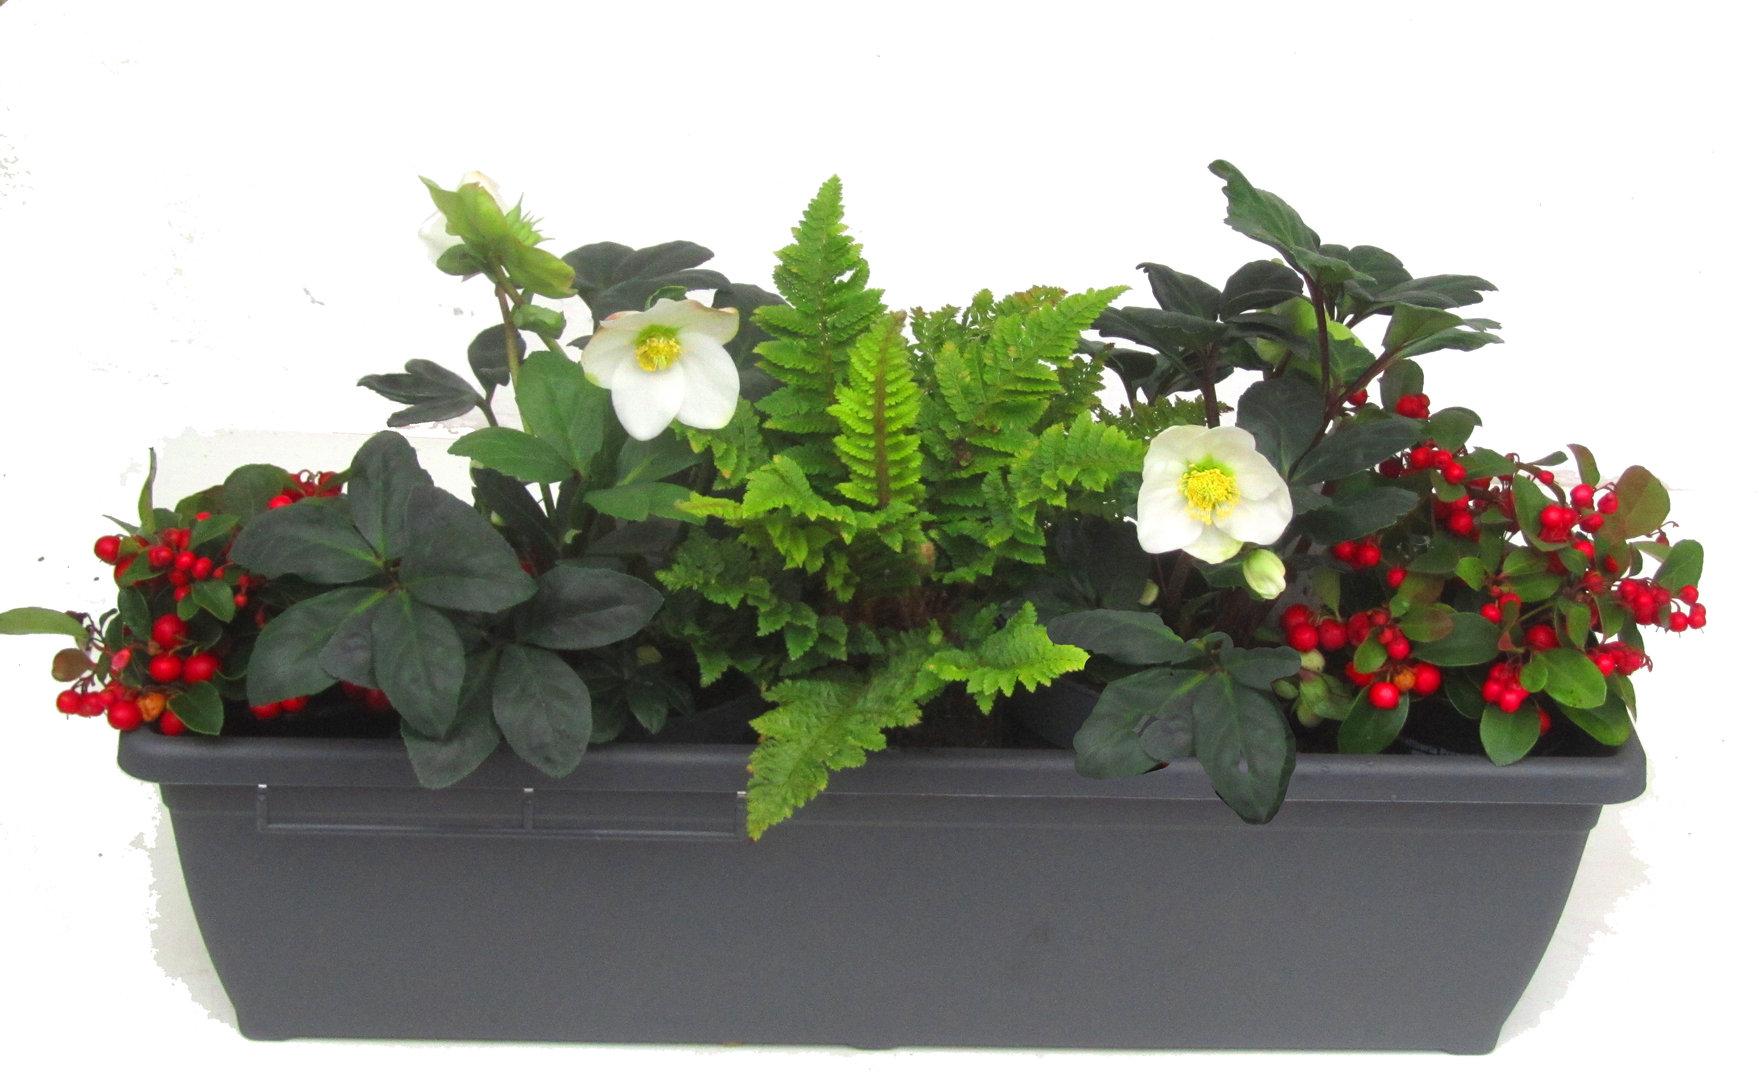 edles balkonpflanzen set f r balkonk sten 60 cm lang pflanzen versand harro 39 s pflanzenwelt. Black Bedroom Furniture Sets. Home Design Ideas